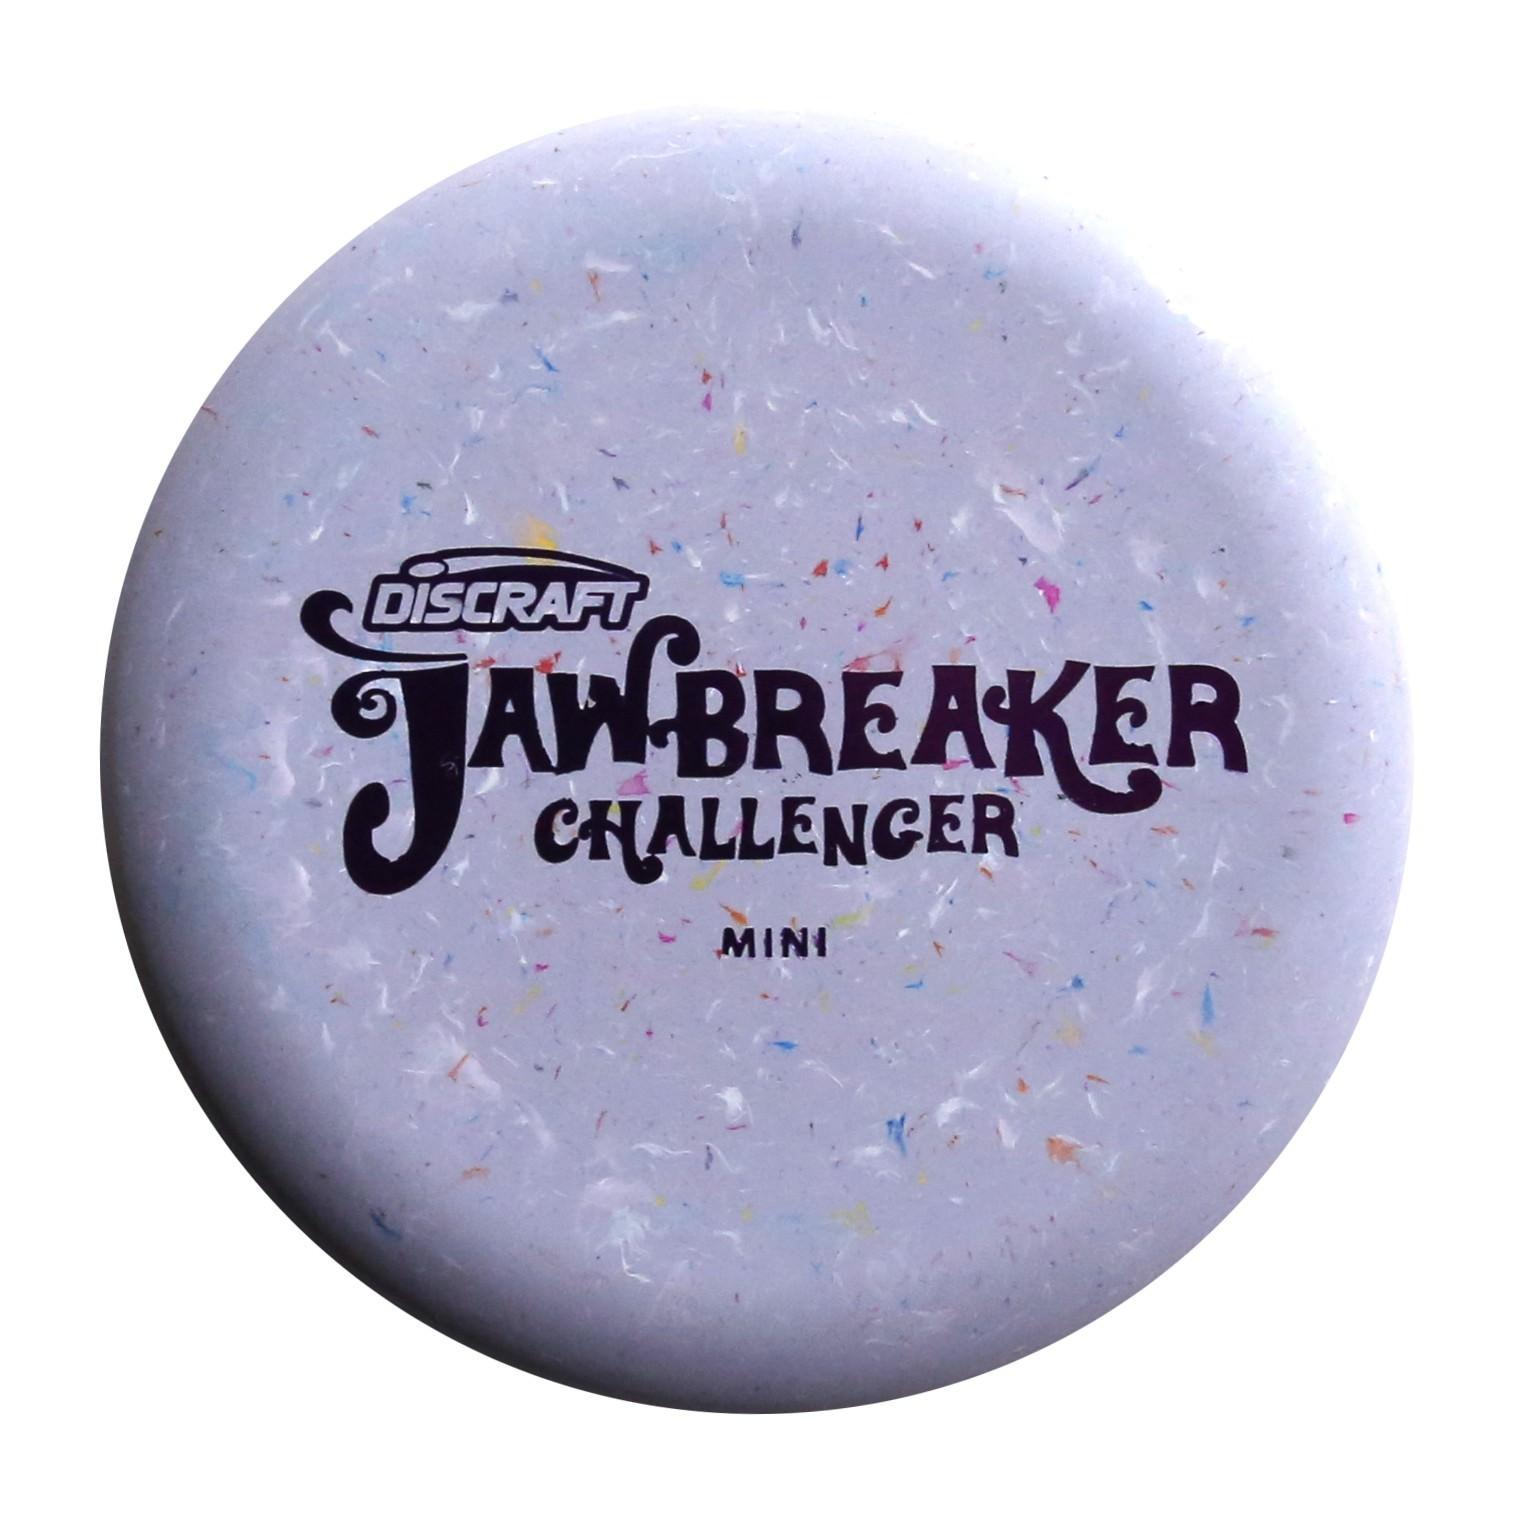 Discraft Jawbreaker Mini Challenger